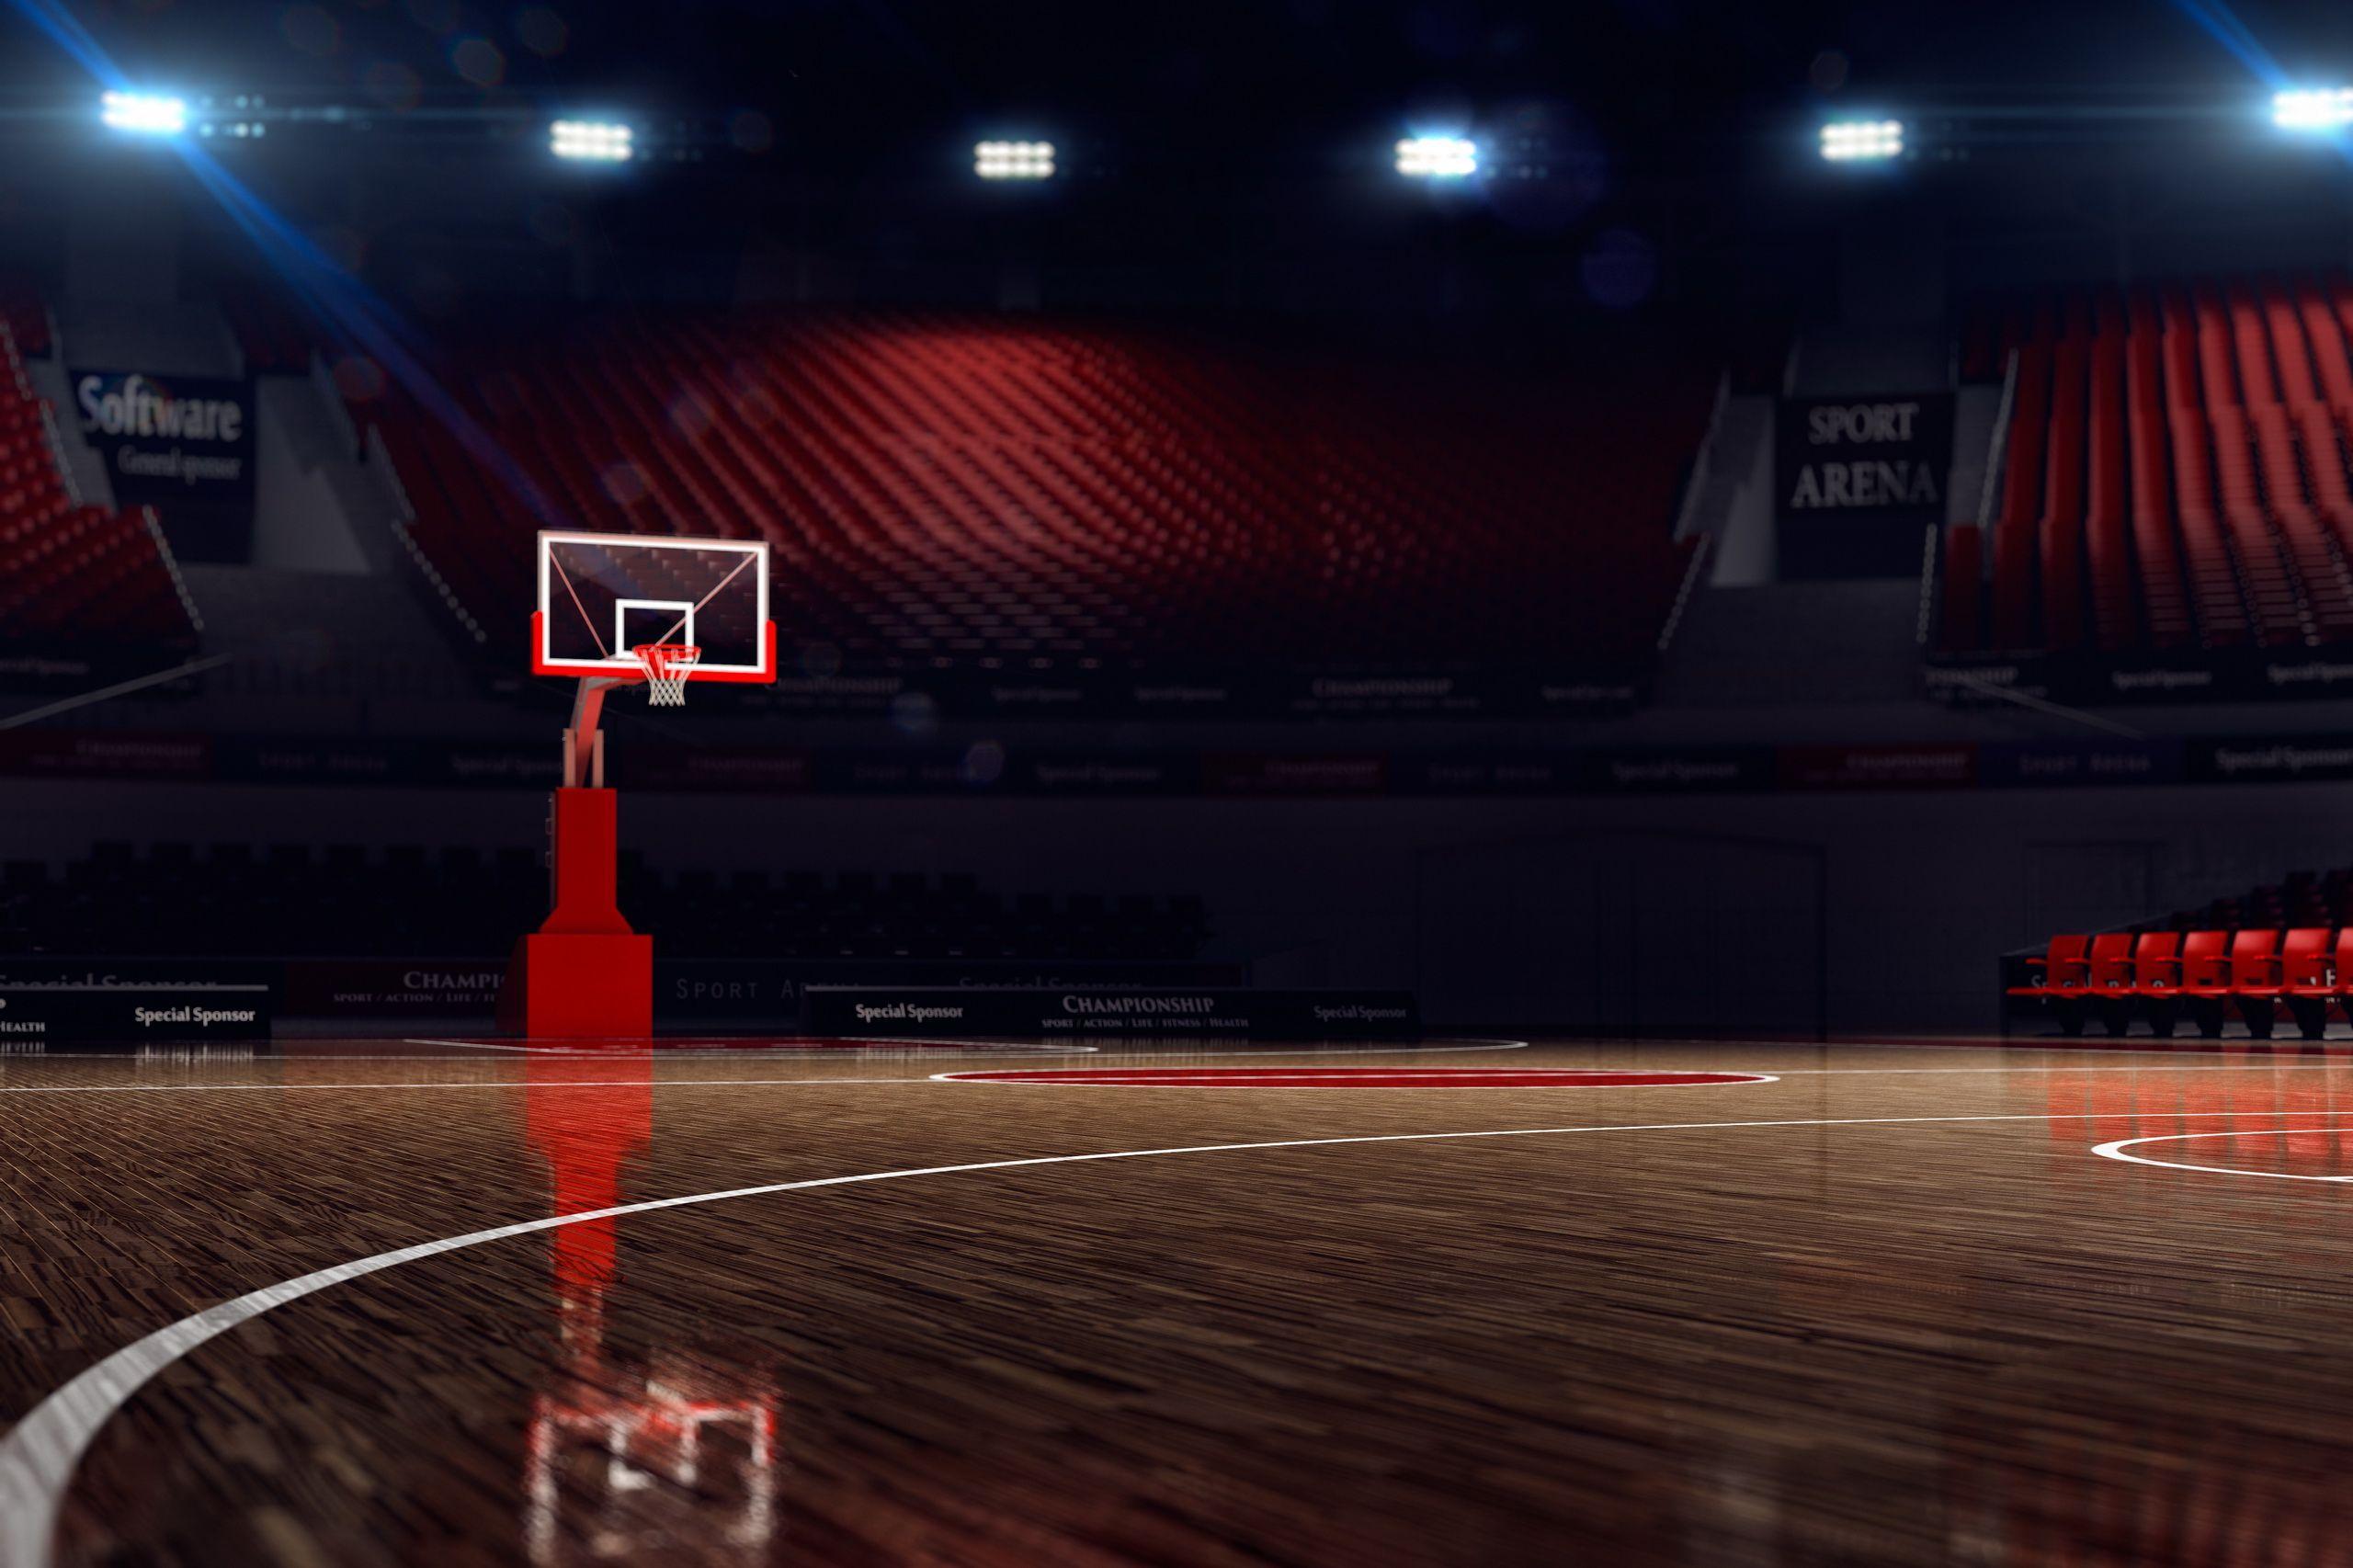 Basketball Court Wallpapers Top Free Basketball Court Backgrounds Wallpaperaccess